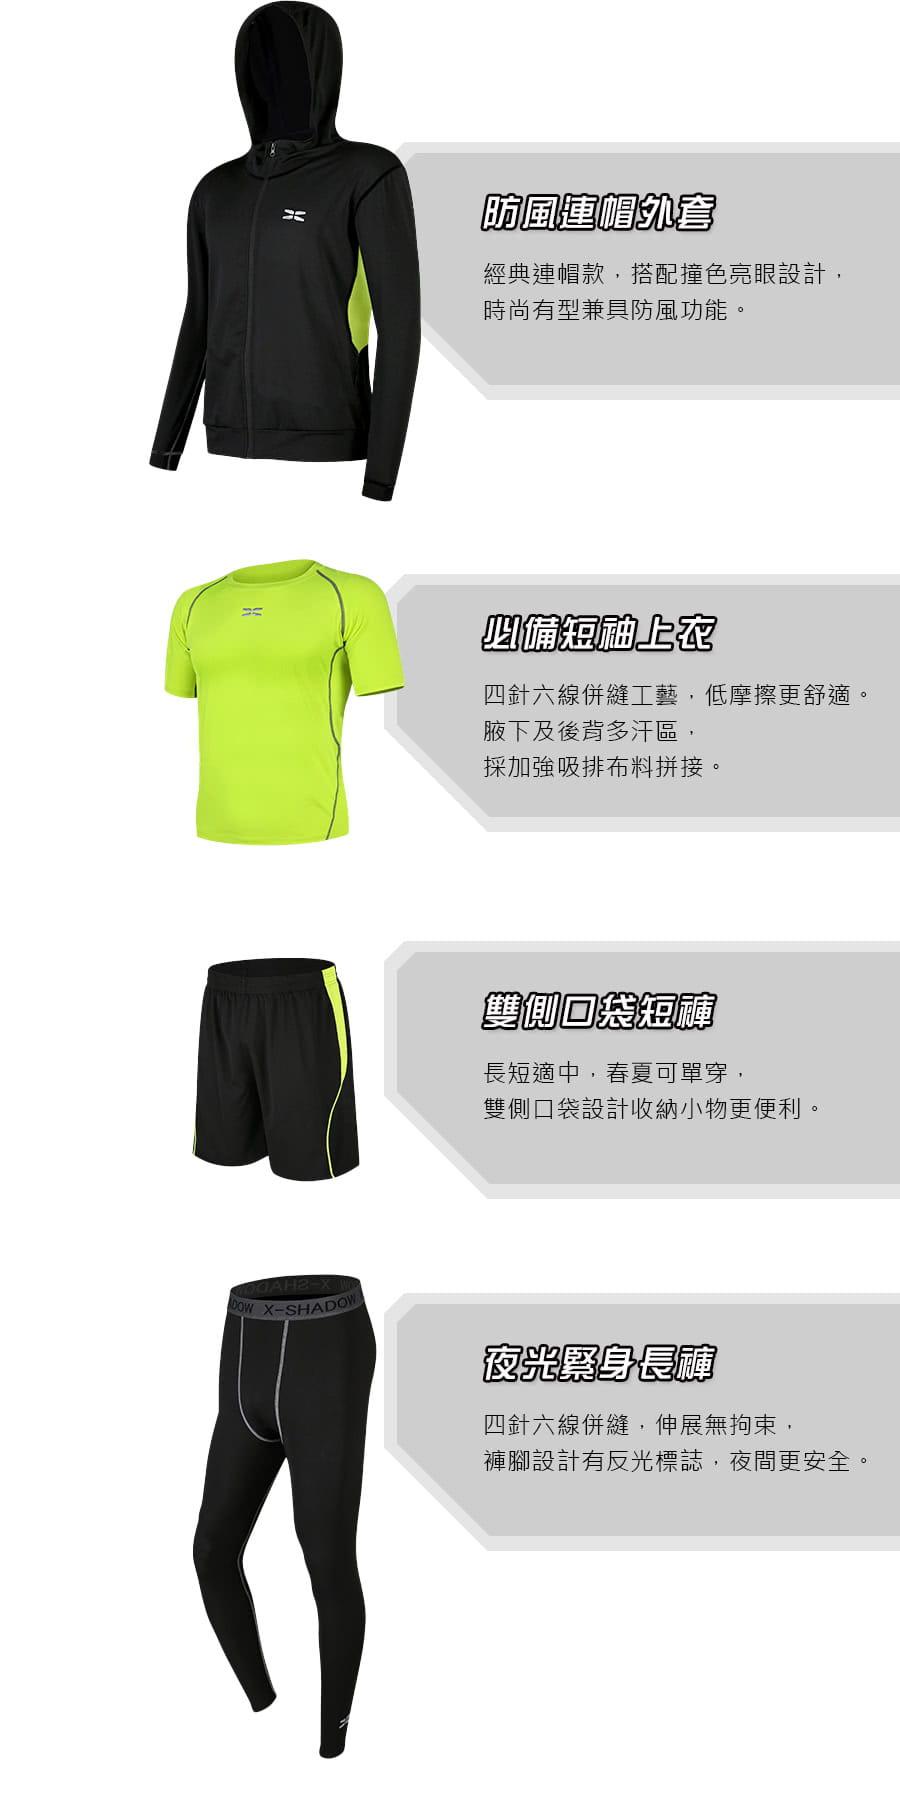 【Un-Sport 高機能】專業健身吸排速乾四件式運動套組(外套+短袖+短褲+緊身長褲) 2